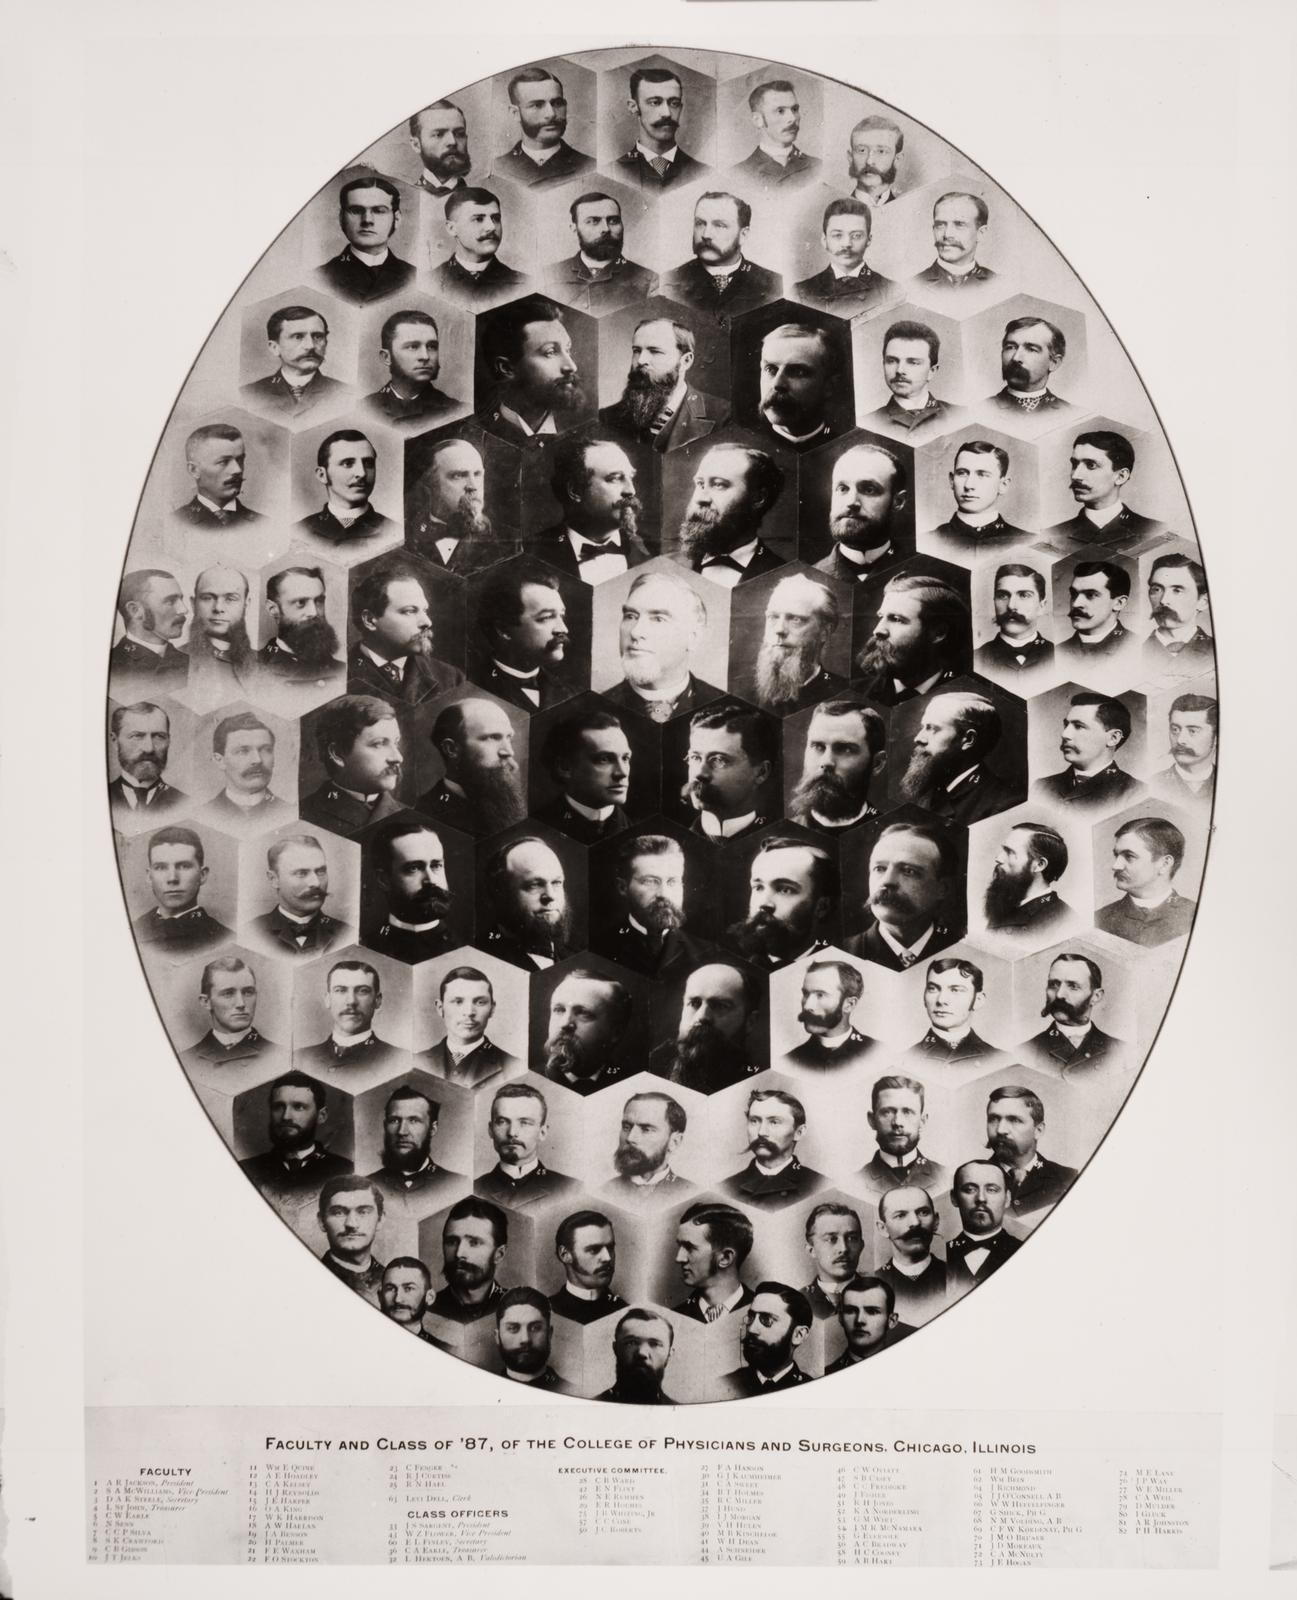 1887 graduating class, University of Illinois College of Medicine